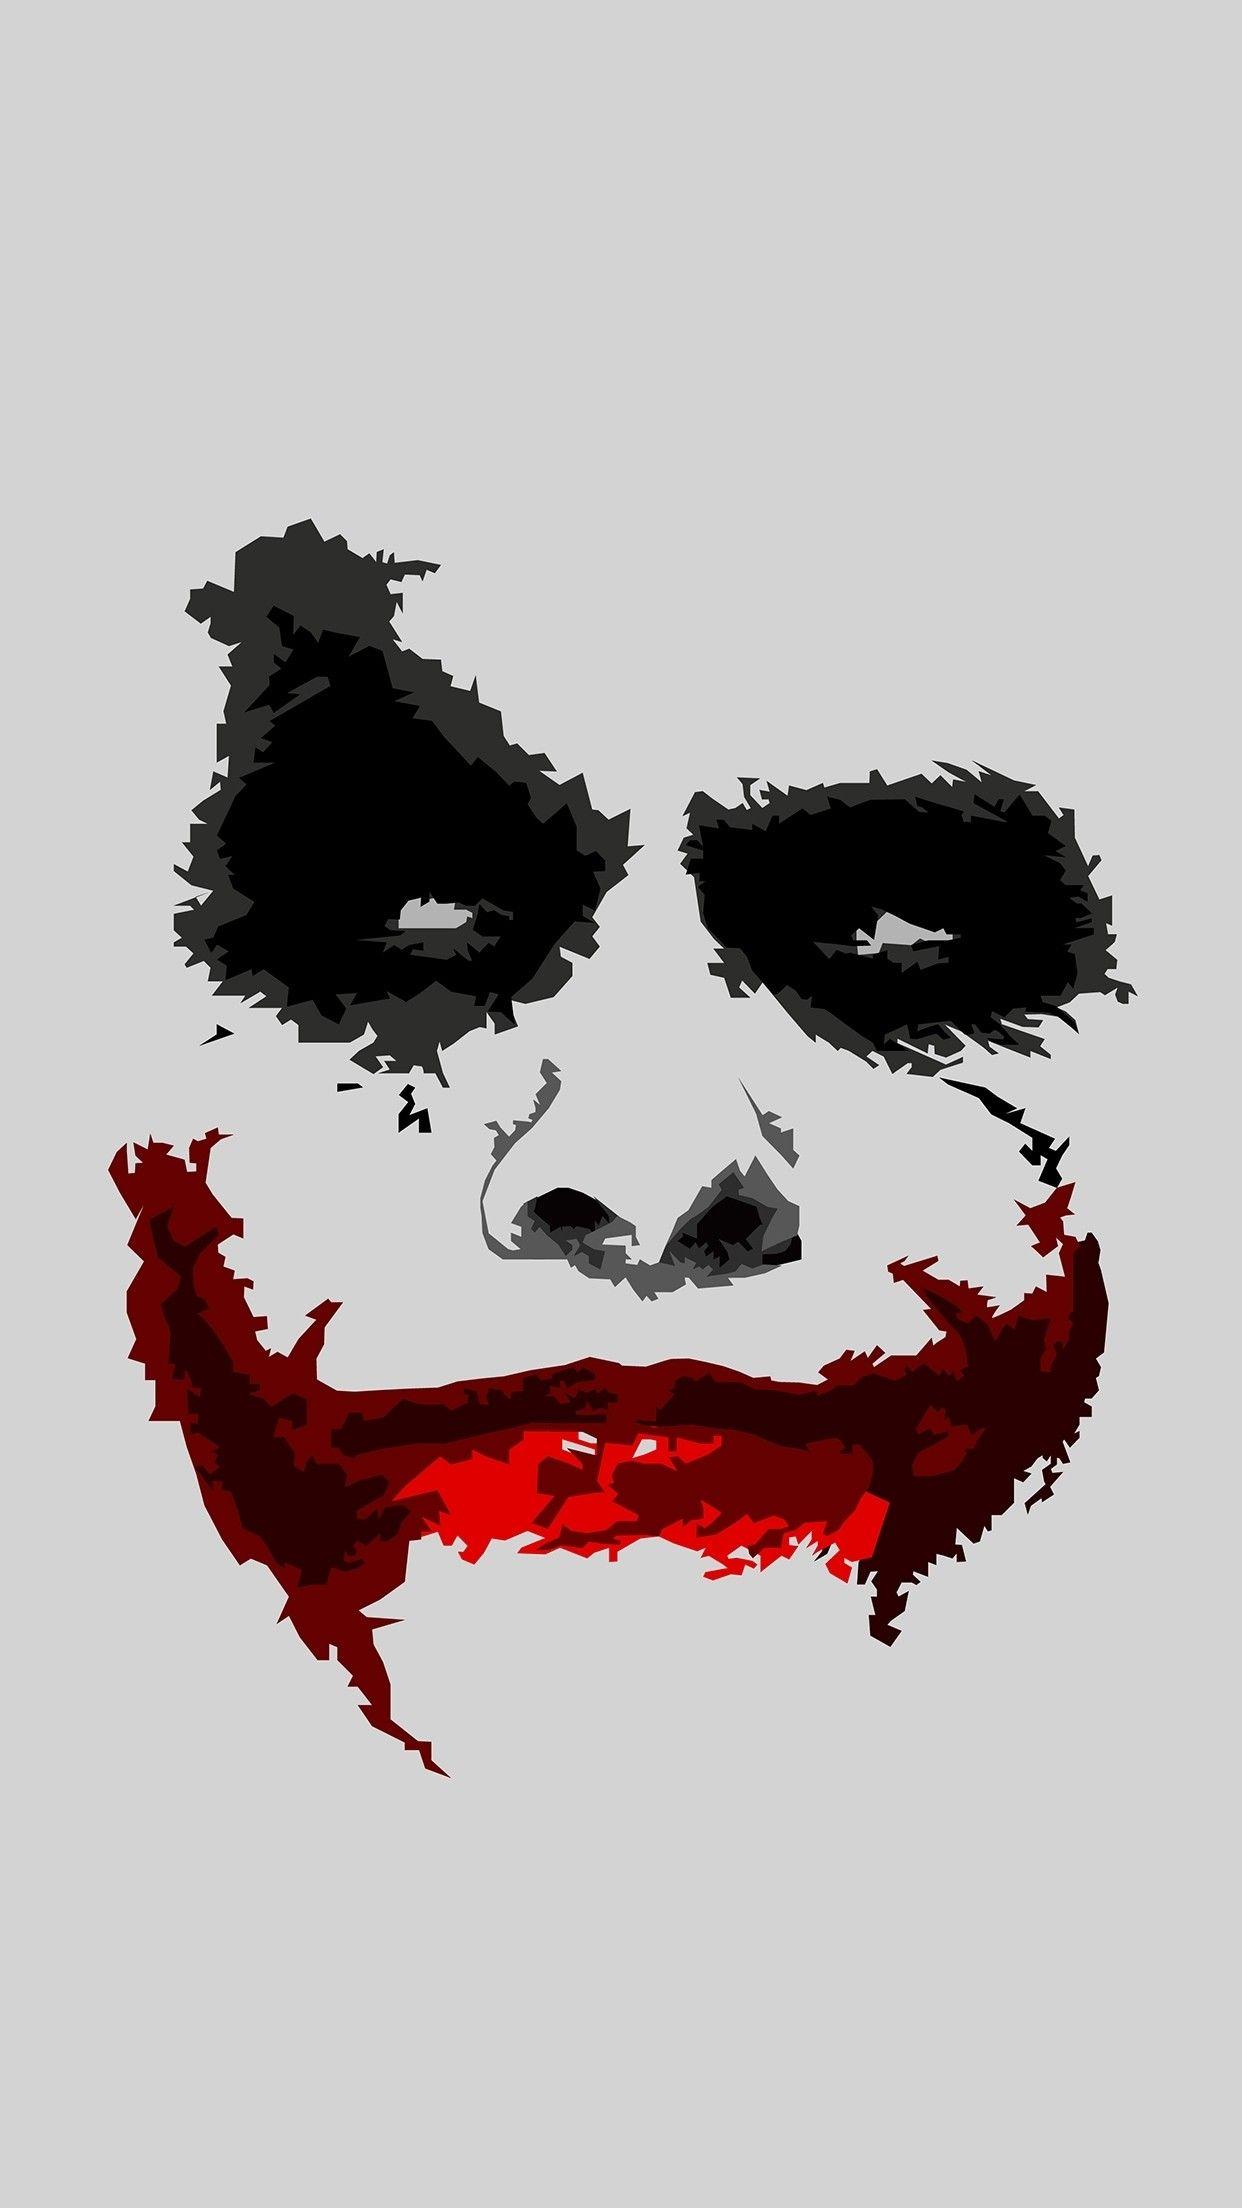 1242x2208 Joker Iphone 6 Wallpaper Wallpapersafari Joker Iphone Wallpaper Joker Wallpapers Joker Artwork